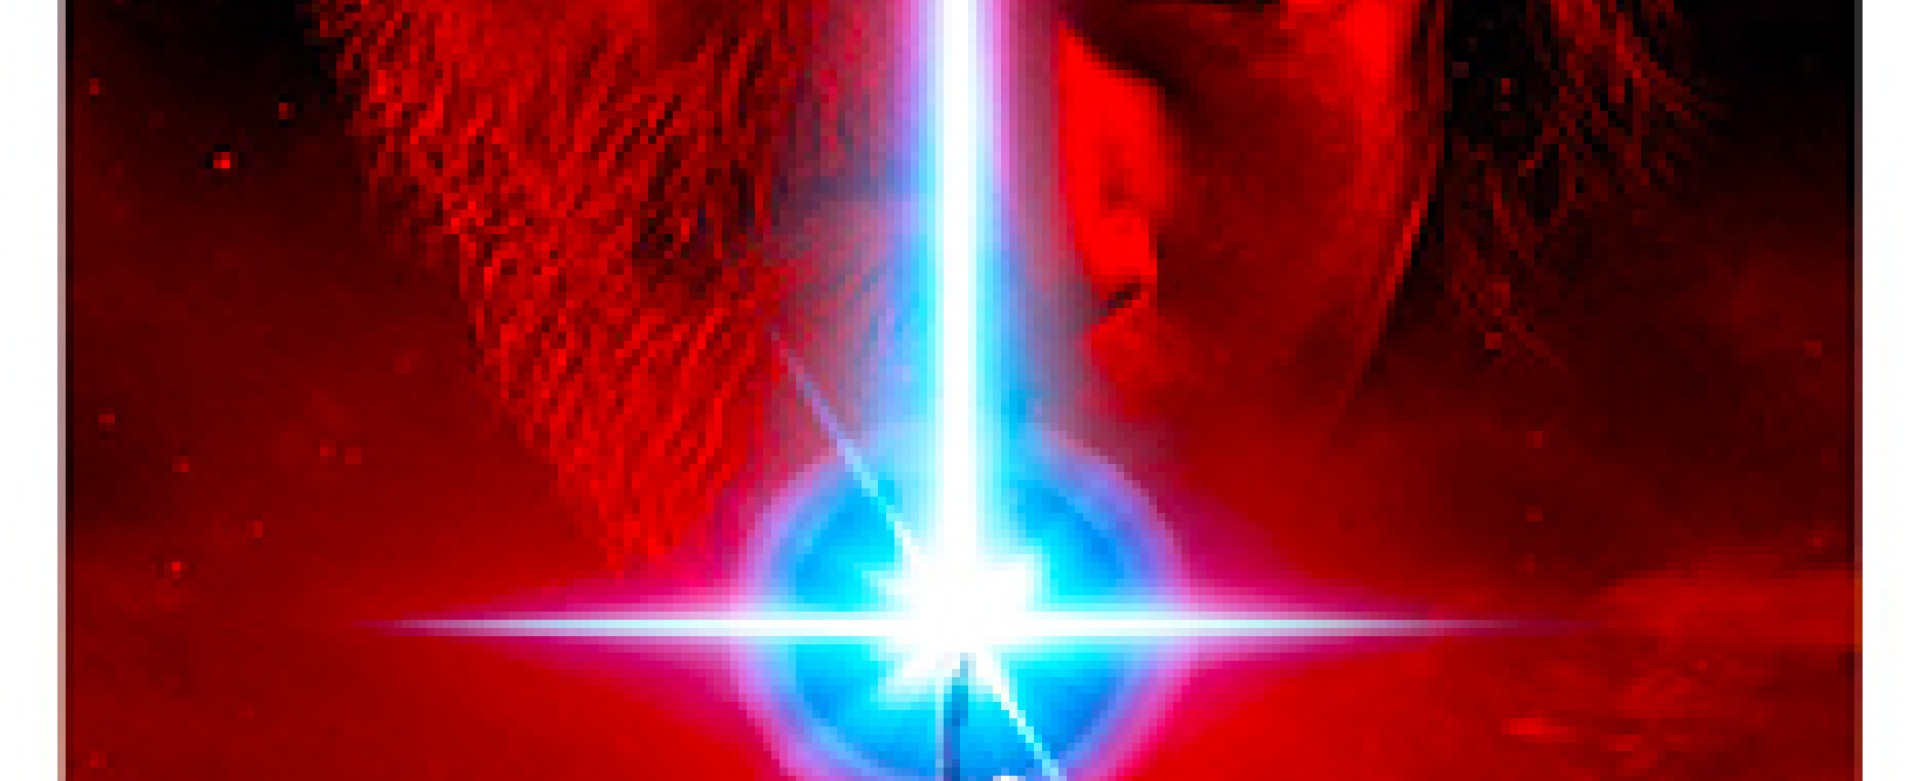 Star Wars 8 - Os Últimos Jedi - 2D   14/12/17